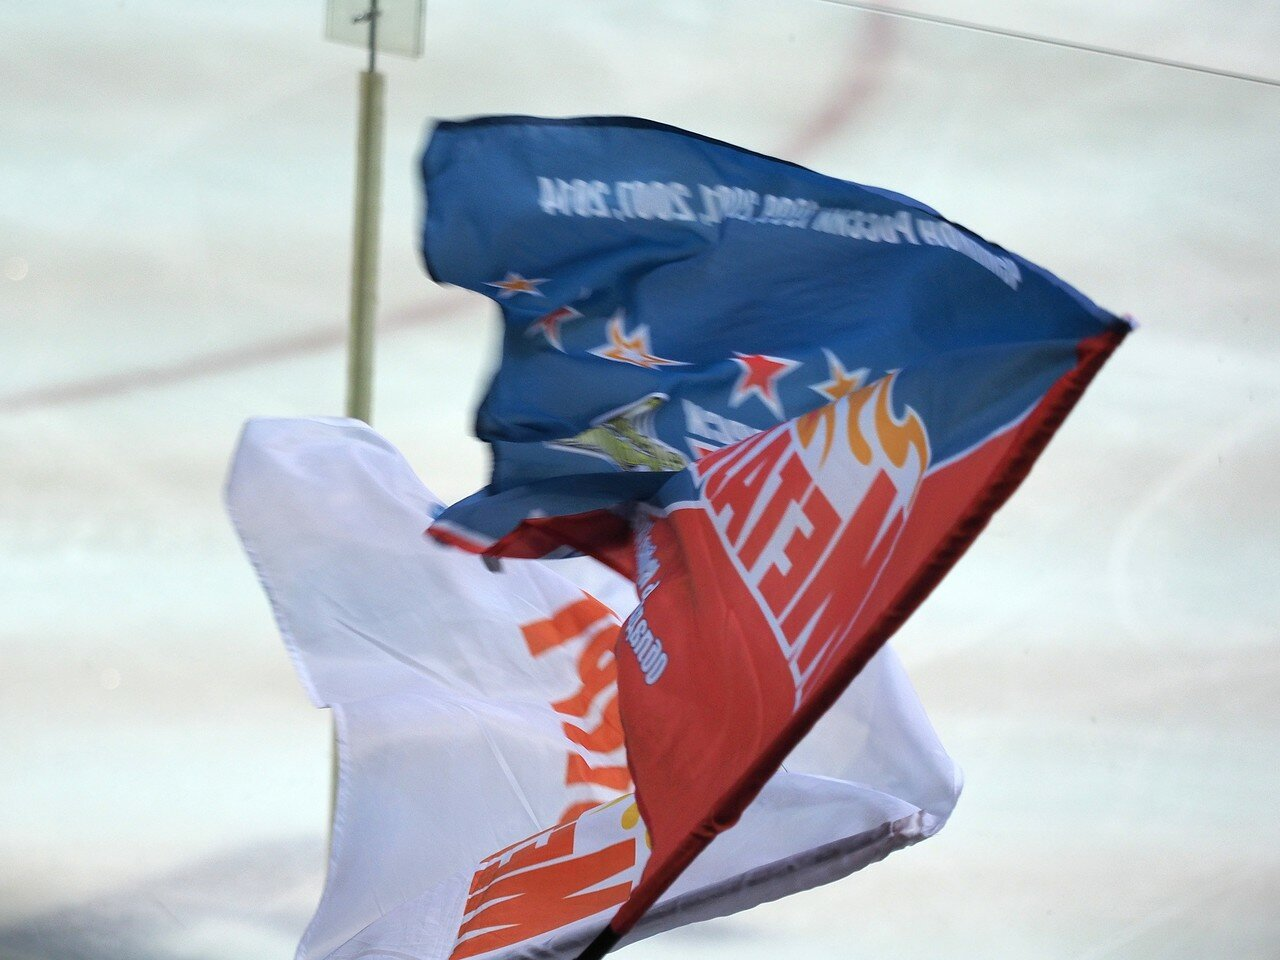 44Плей-офф 2016 Восток Финал Металлург - Салават Юлаев 31.03.2016